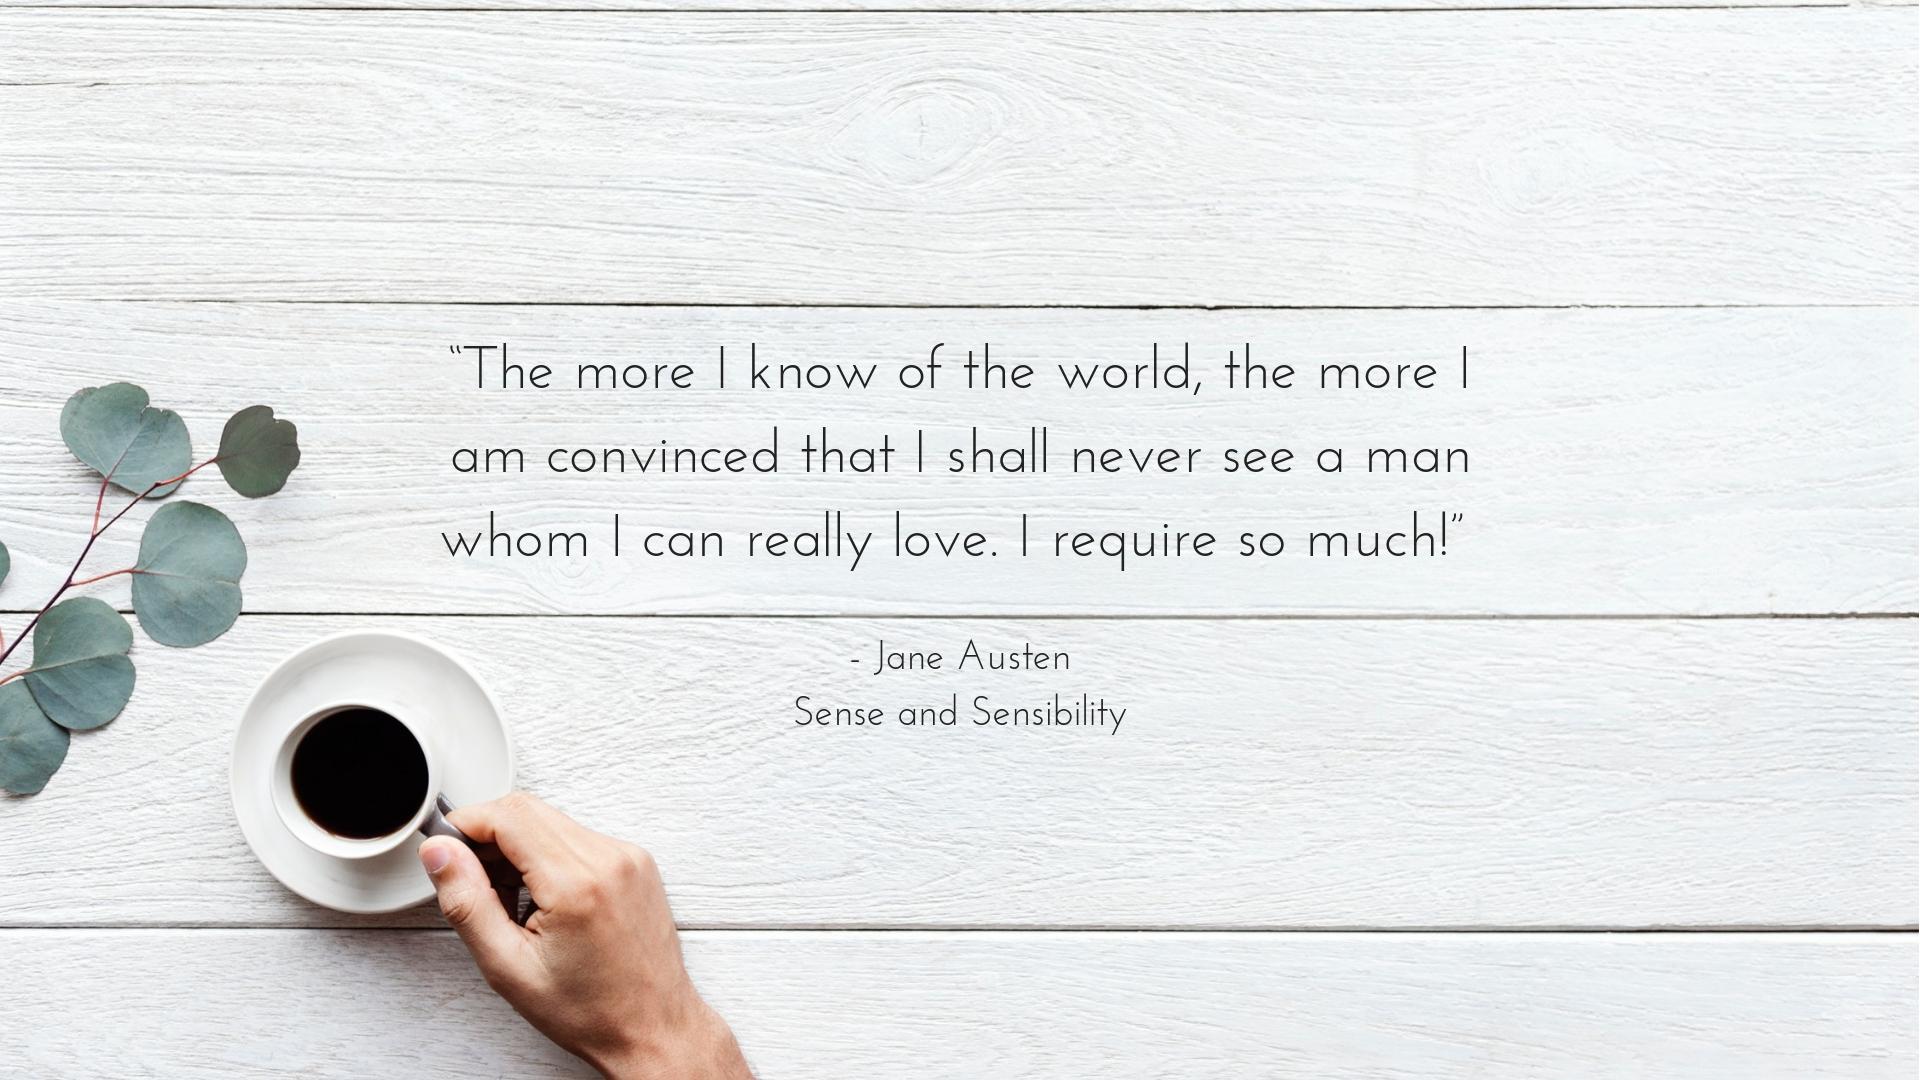 banner-lines-to-love-jane-austen-speaks-08.jpg